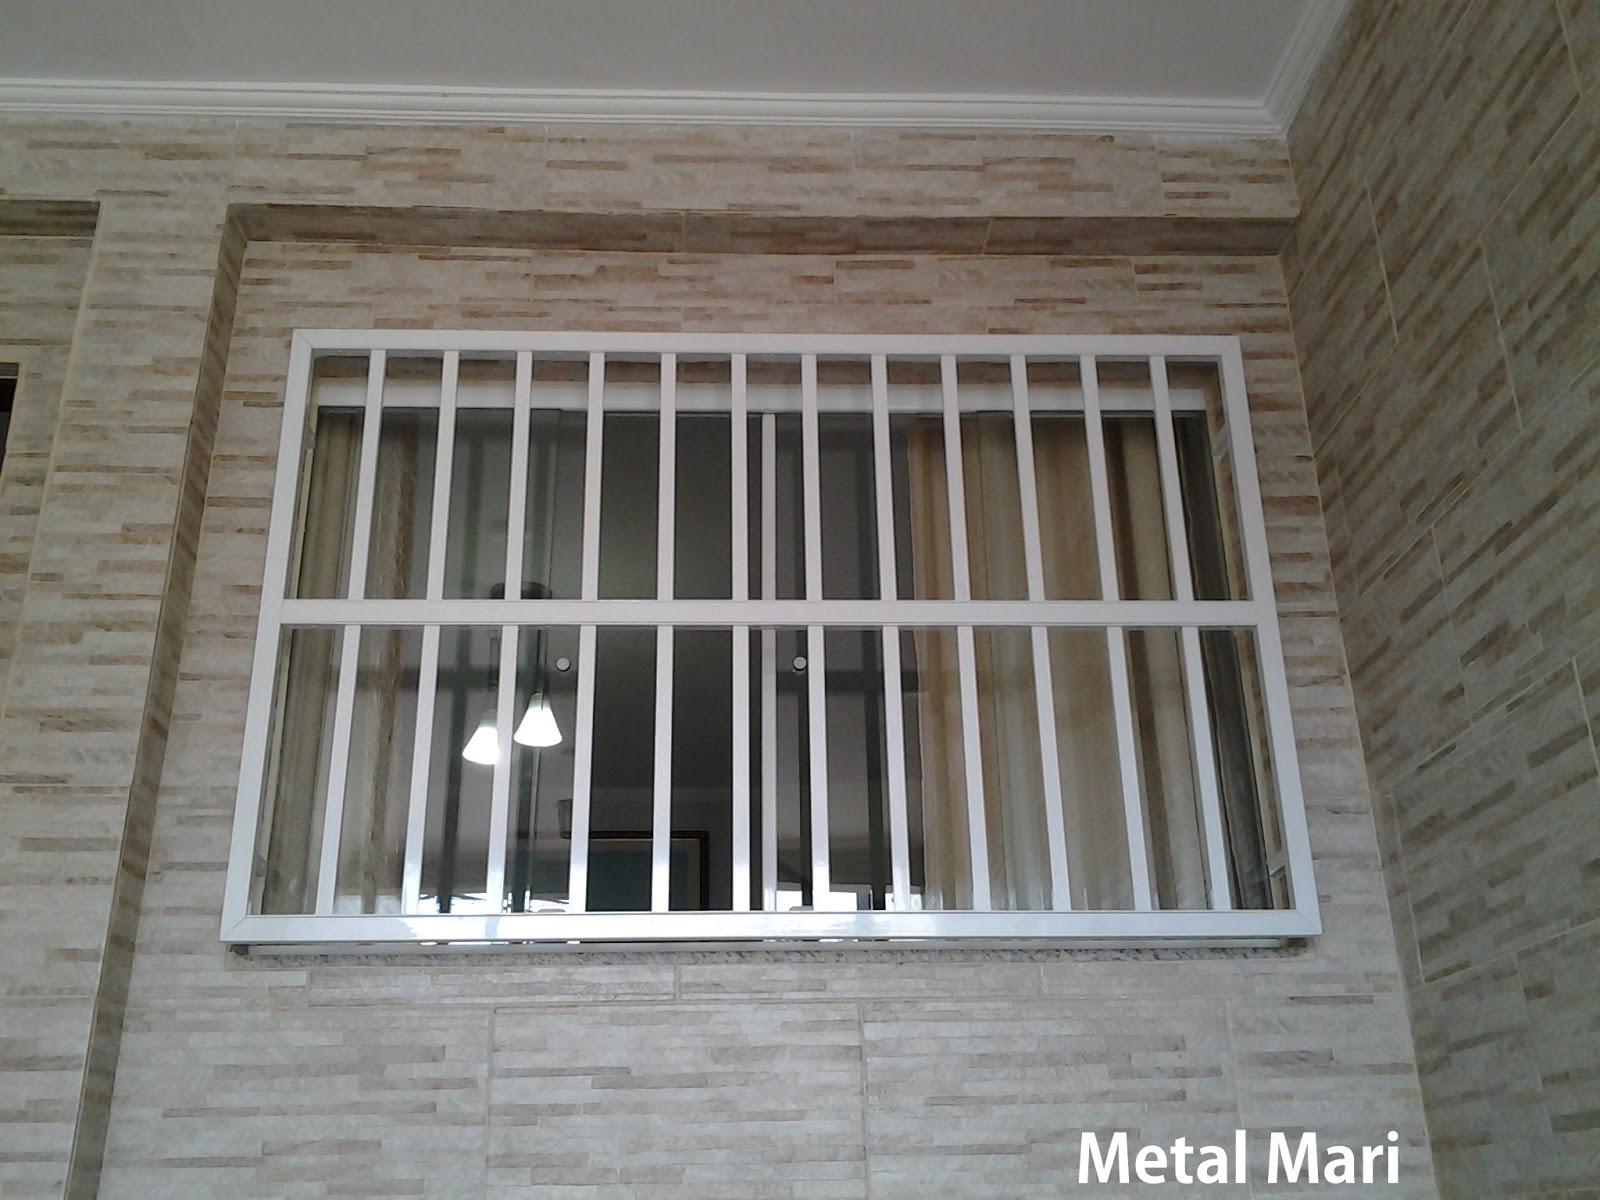 #5A5042 Grade de alumínio branco (Metal Mari) 4334 Janela Aluminio Com Grade Preço